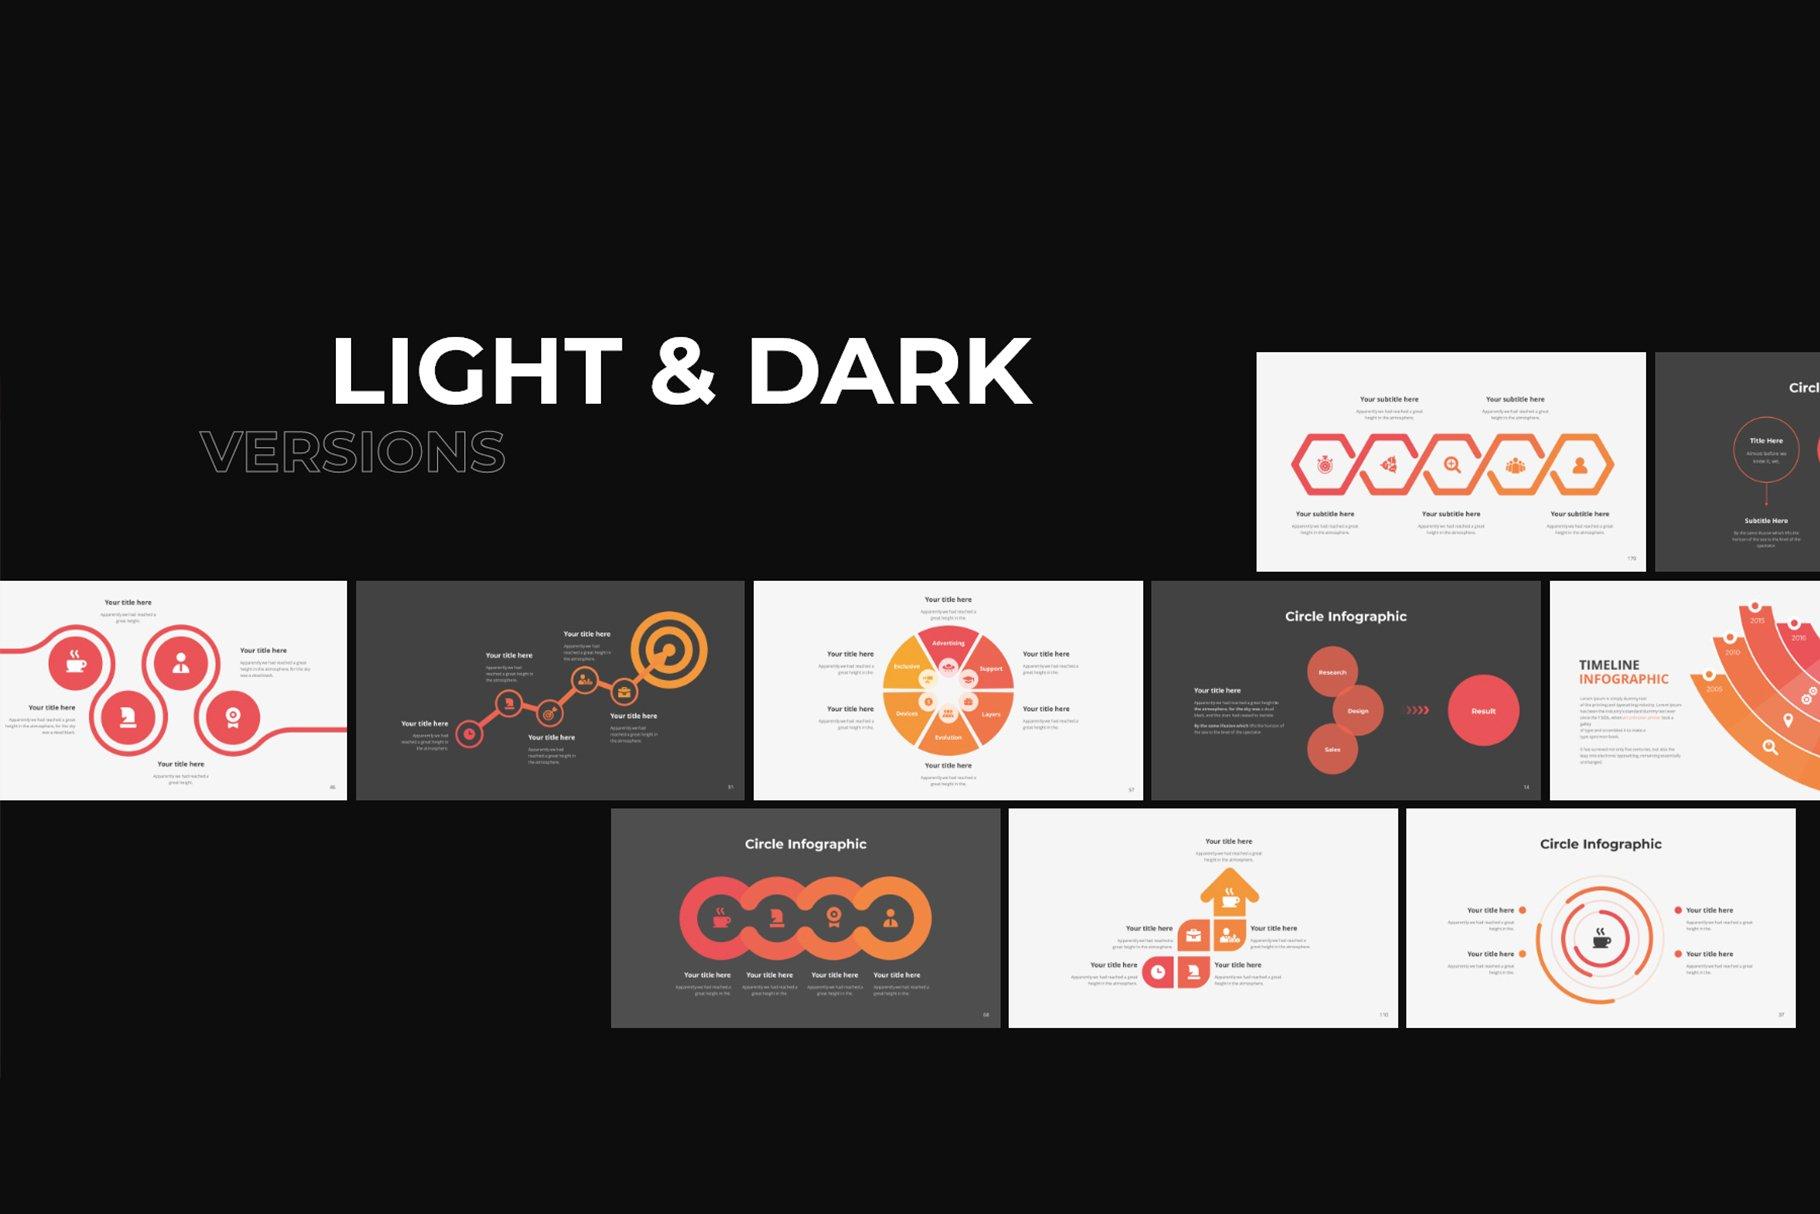 Light and dark themes.